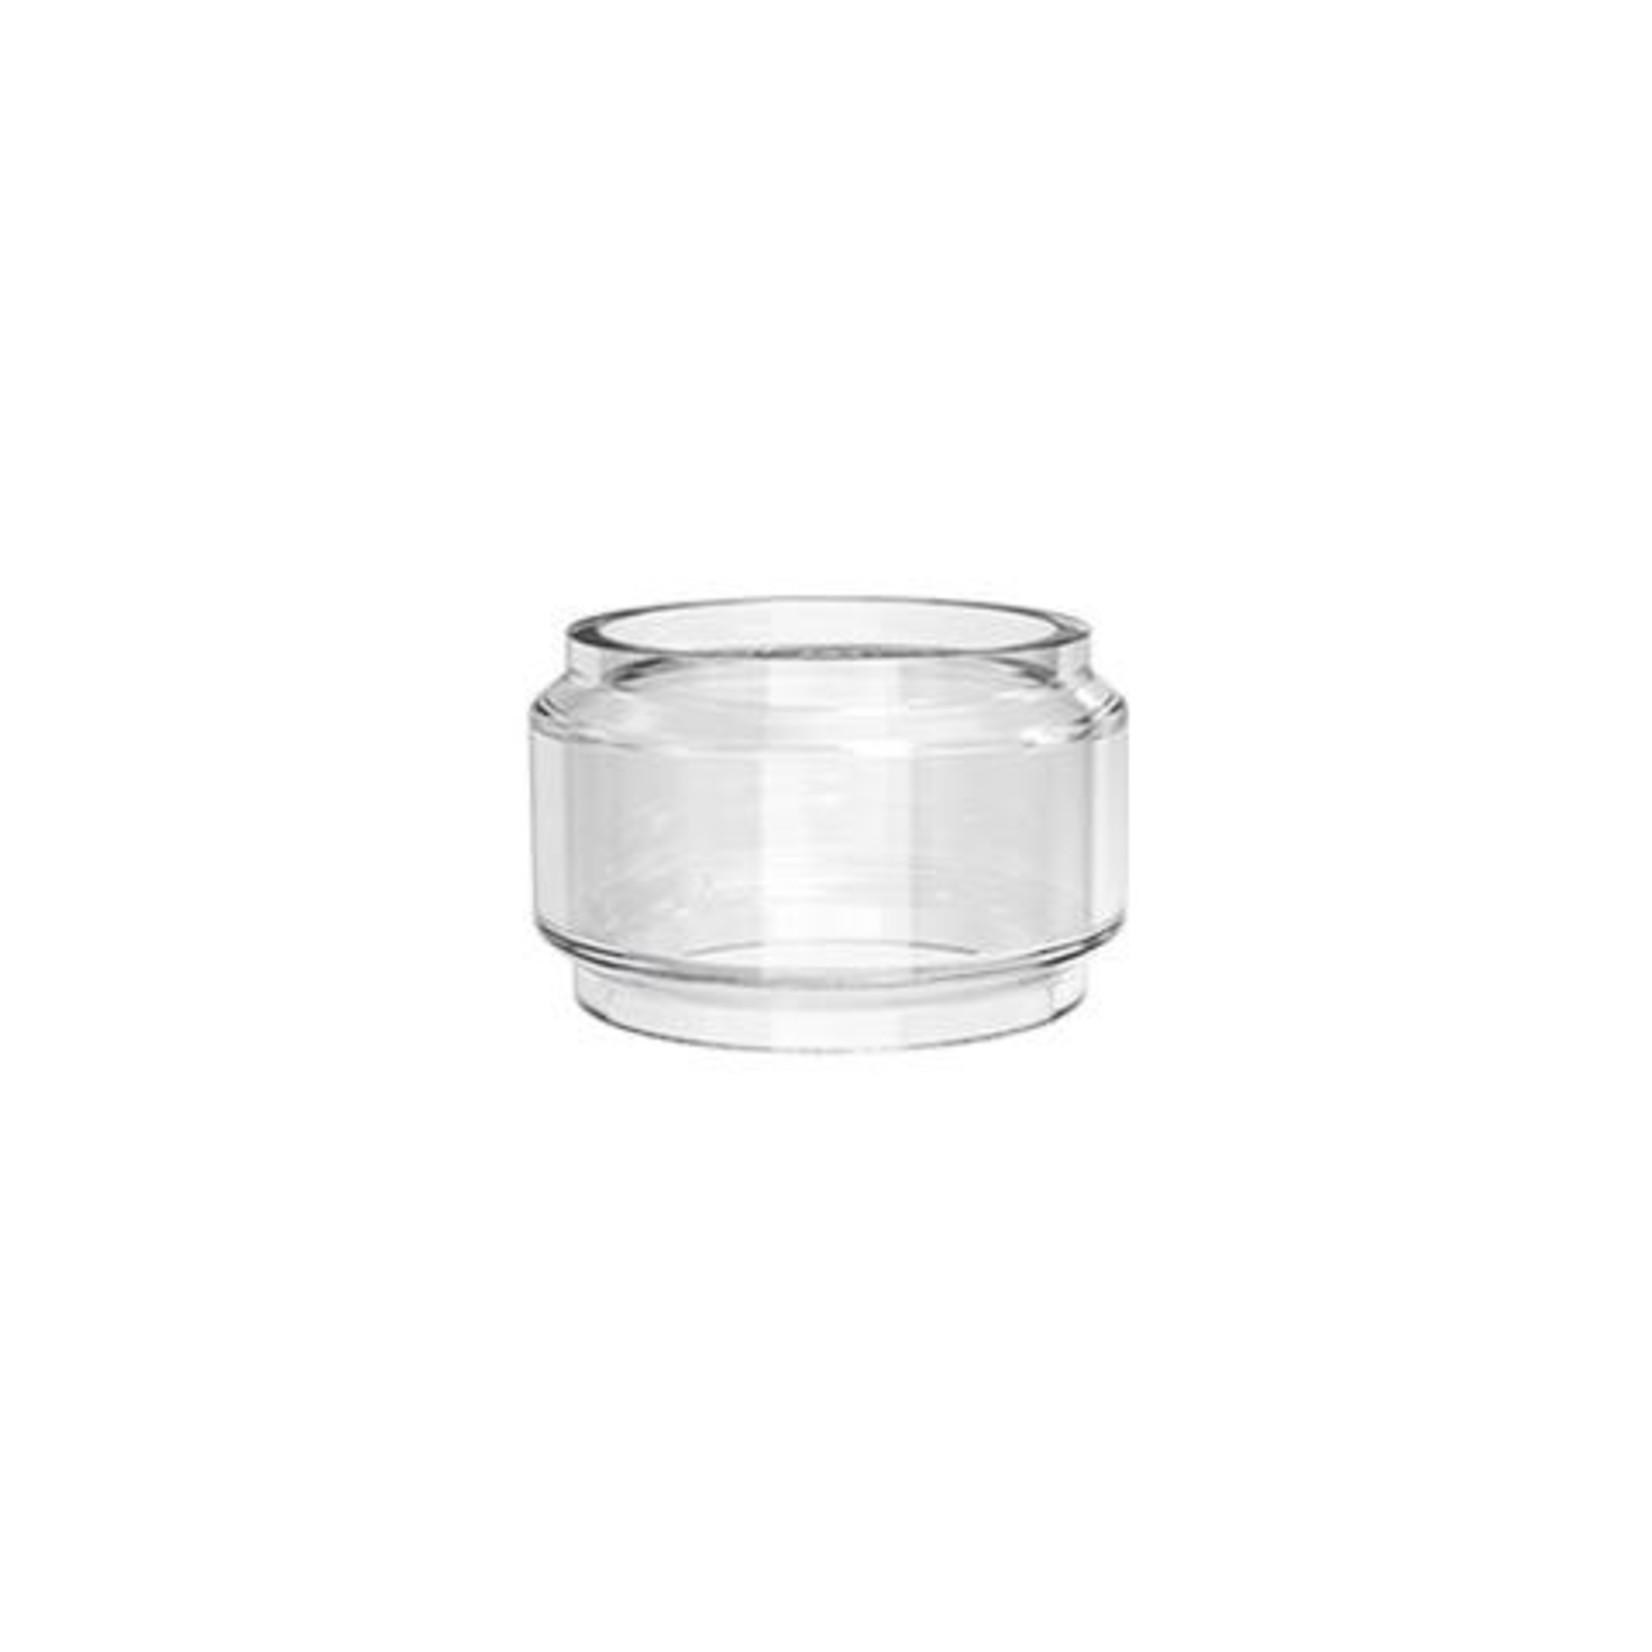 Horizon Falcon / Falcon King Bulb Glass 7ml